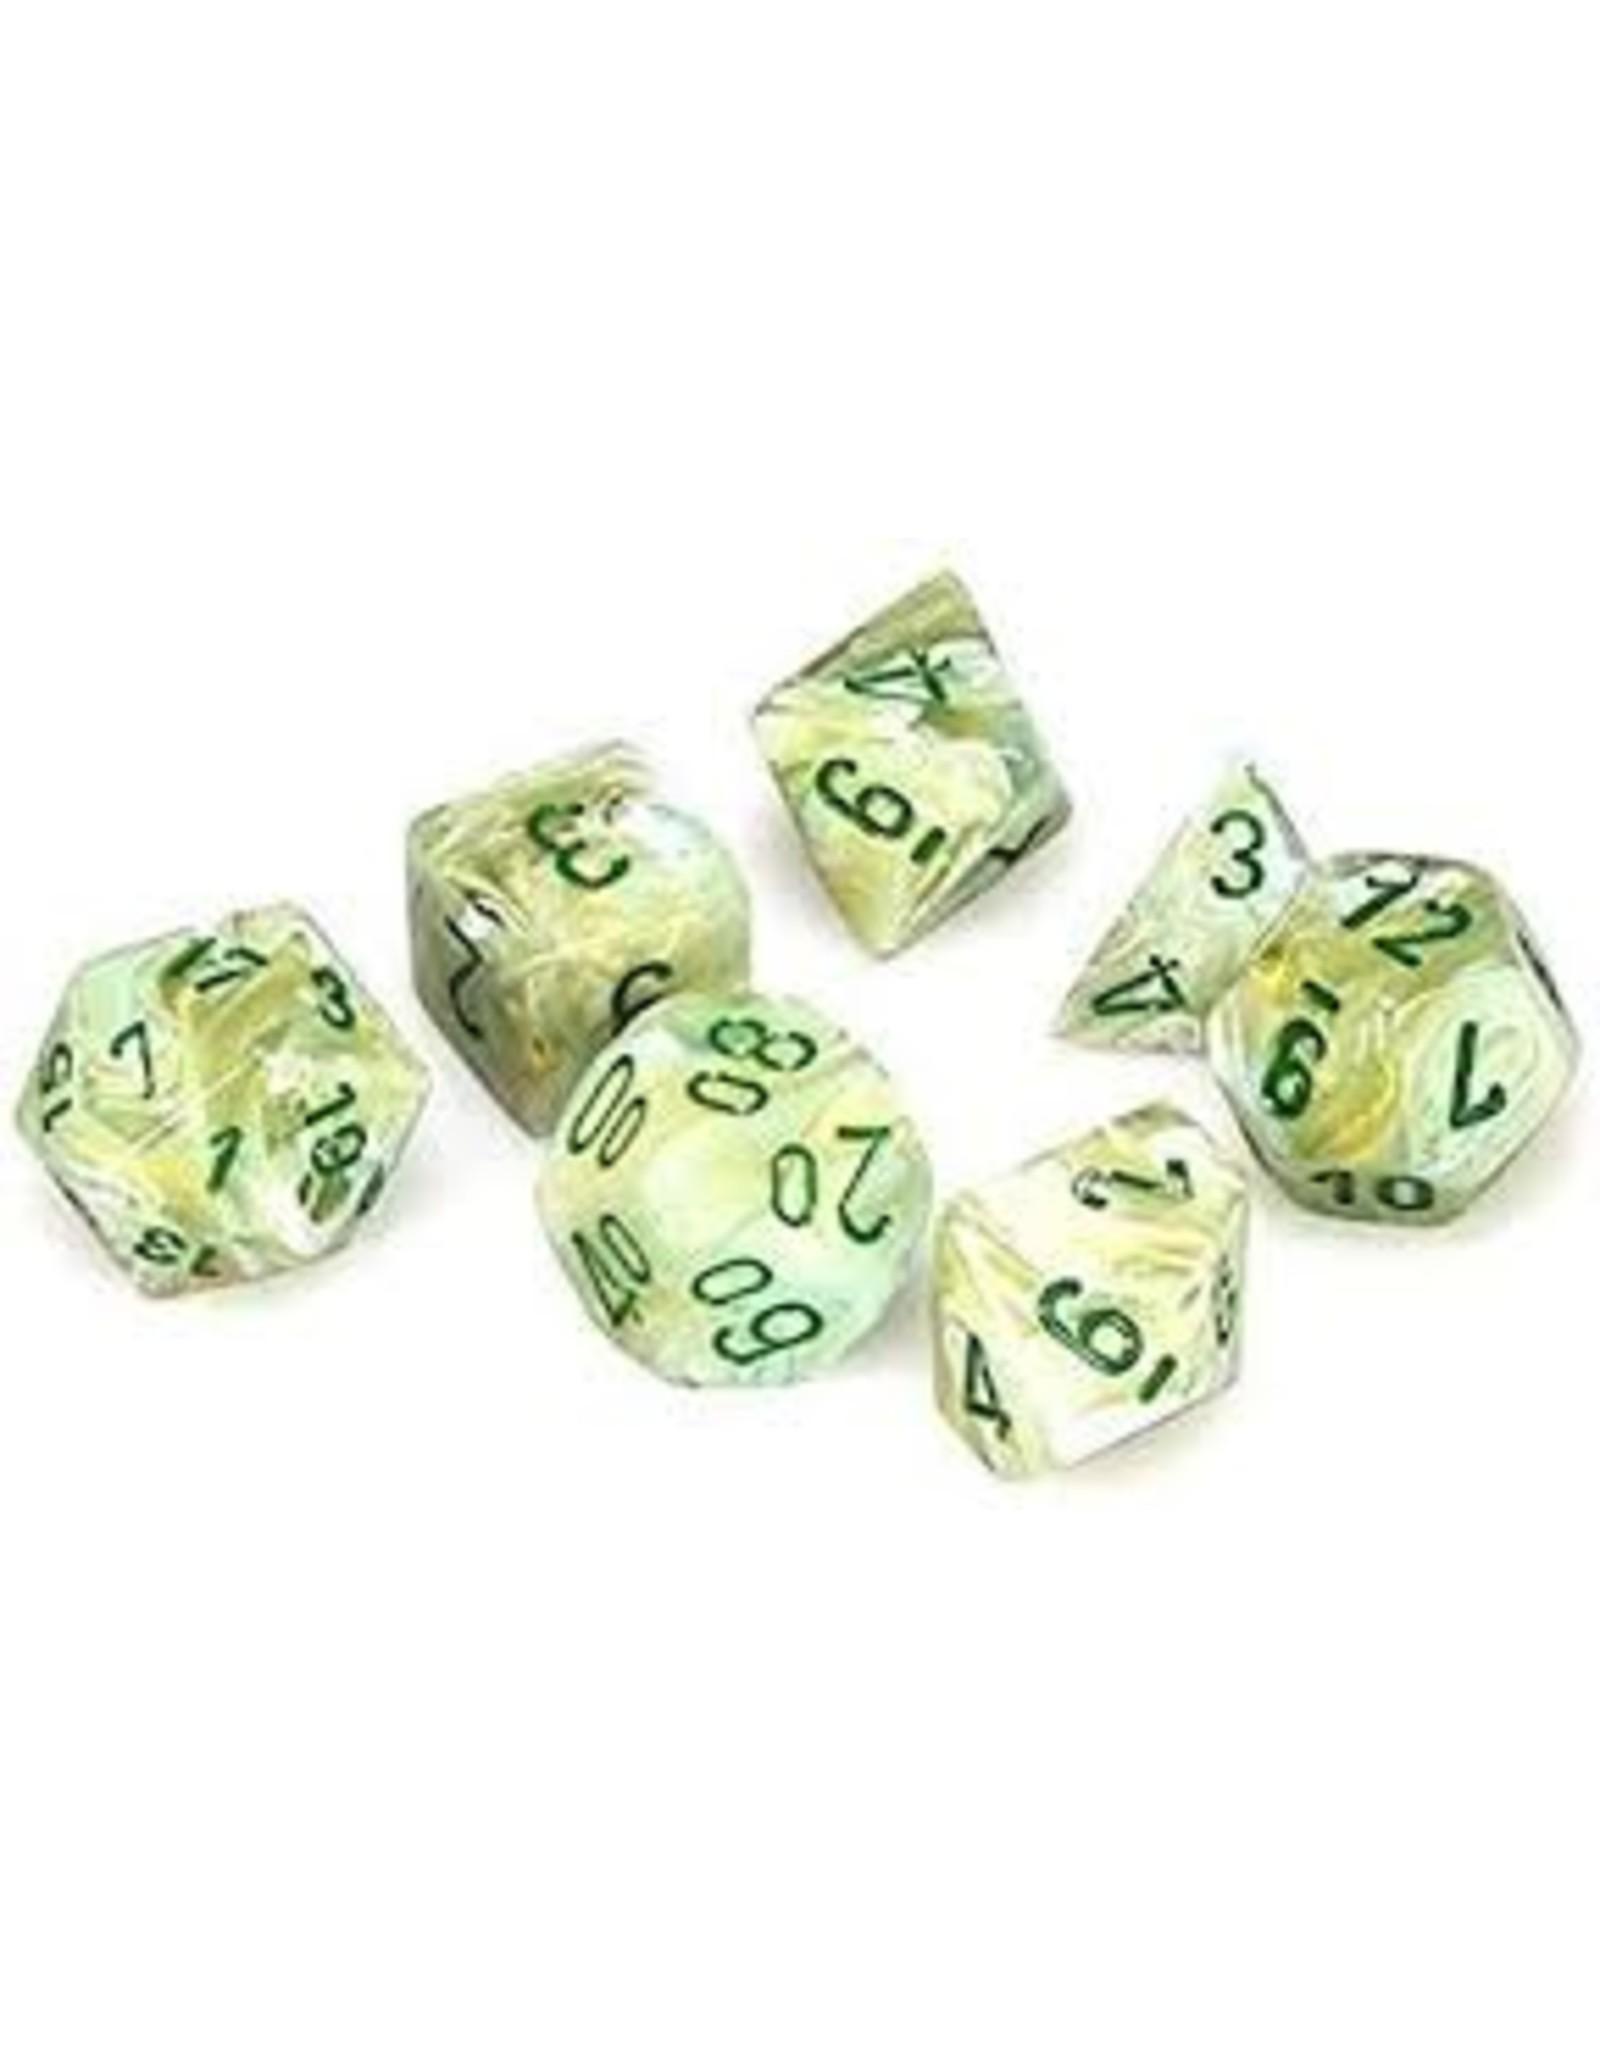 Chessex 7-Set Polyhedral  Marble Green/Dark Green